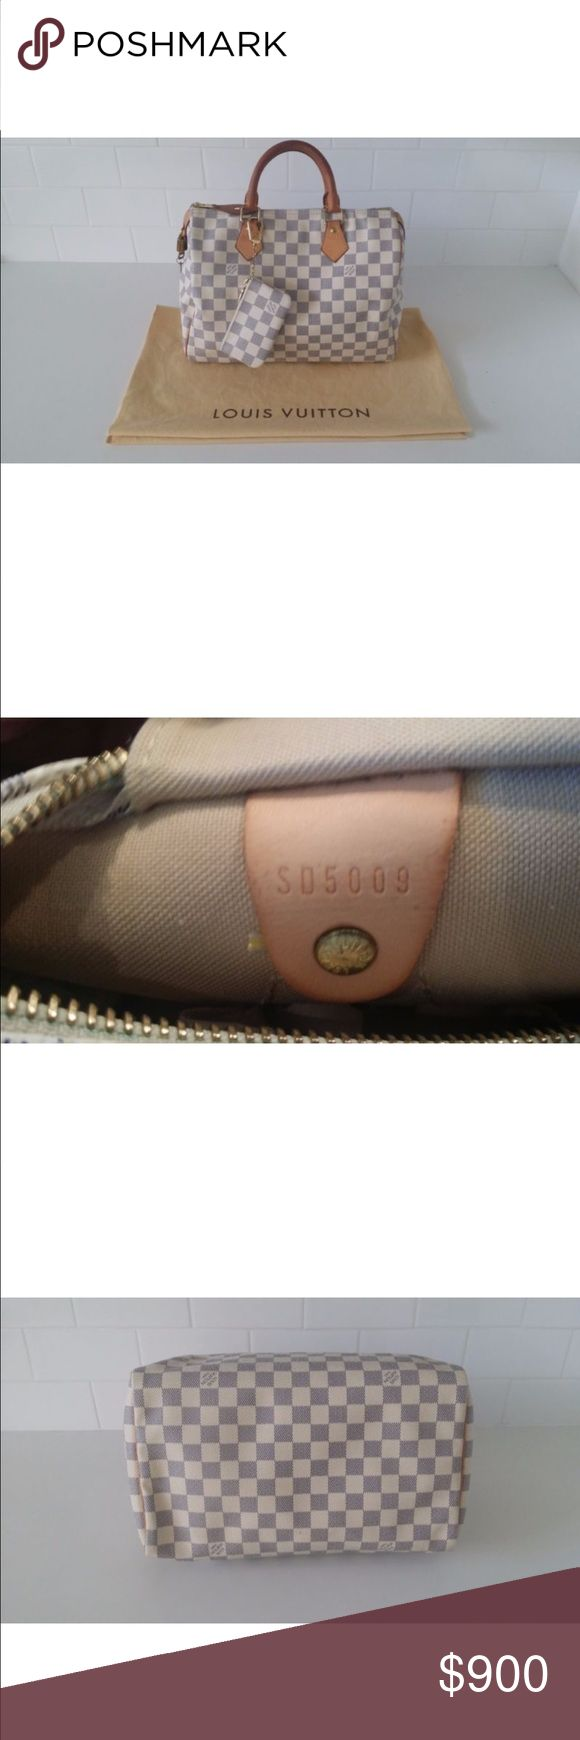 Authentic Louis Vuitton Damier Azur Speedy30 Authentic Louis Vuitton Damier Azur Speedy30 Handbag-Lock,Key, Pouch, Dustbag lower price on PayPal or venmo 😀 Louis Vuitton Bags